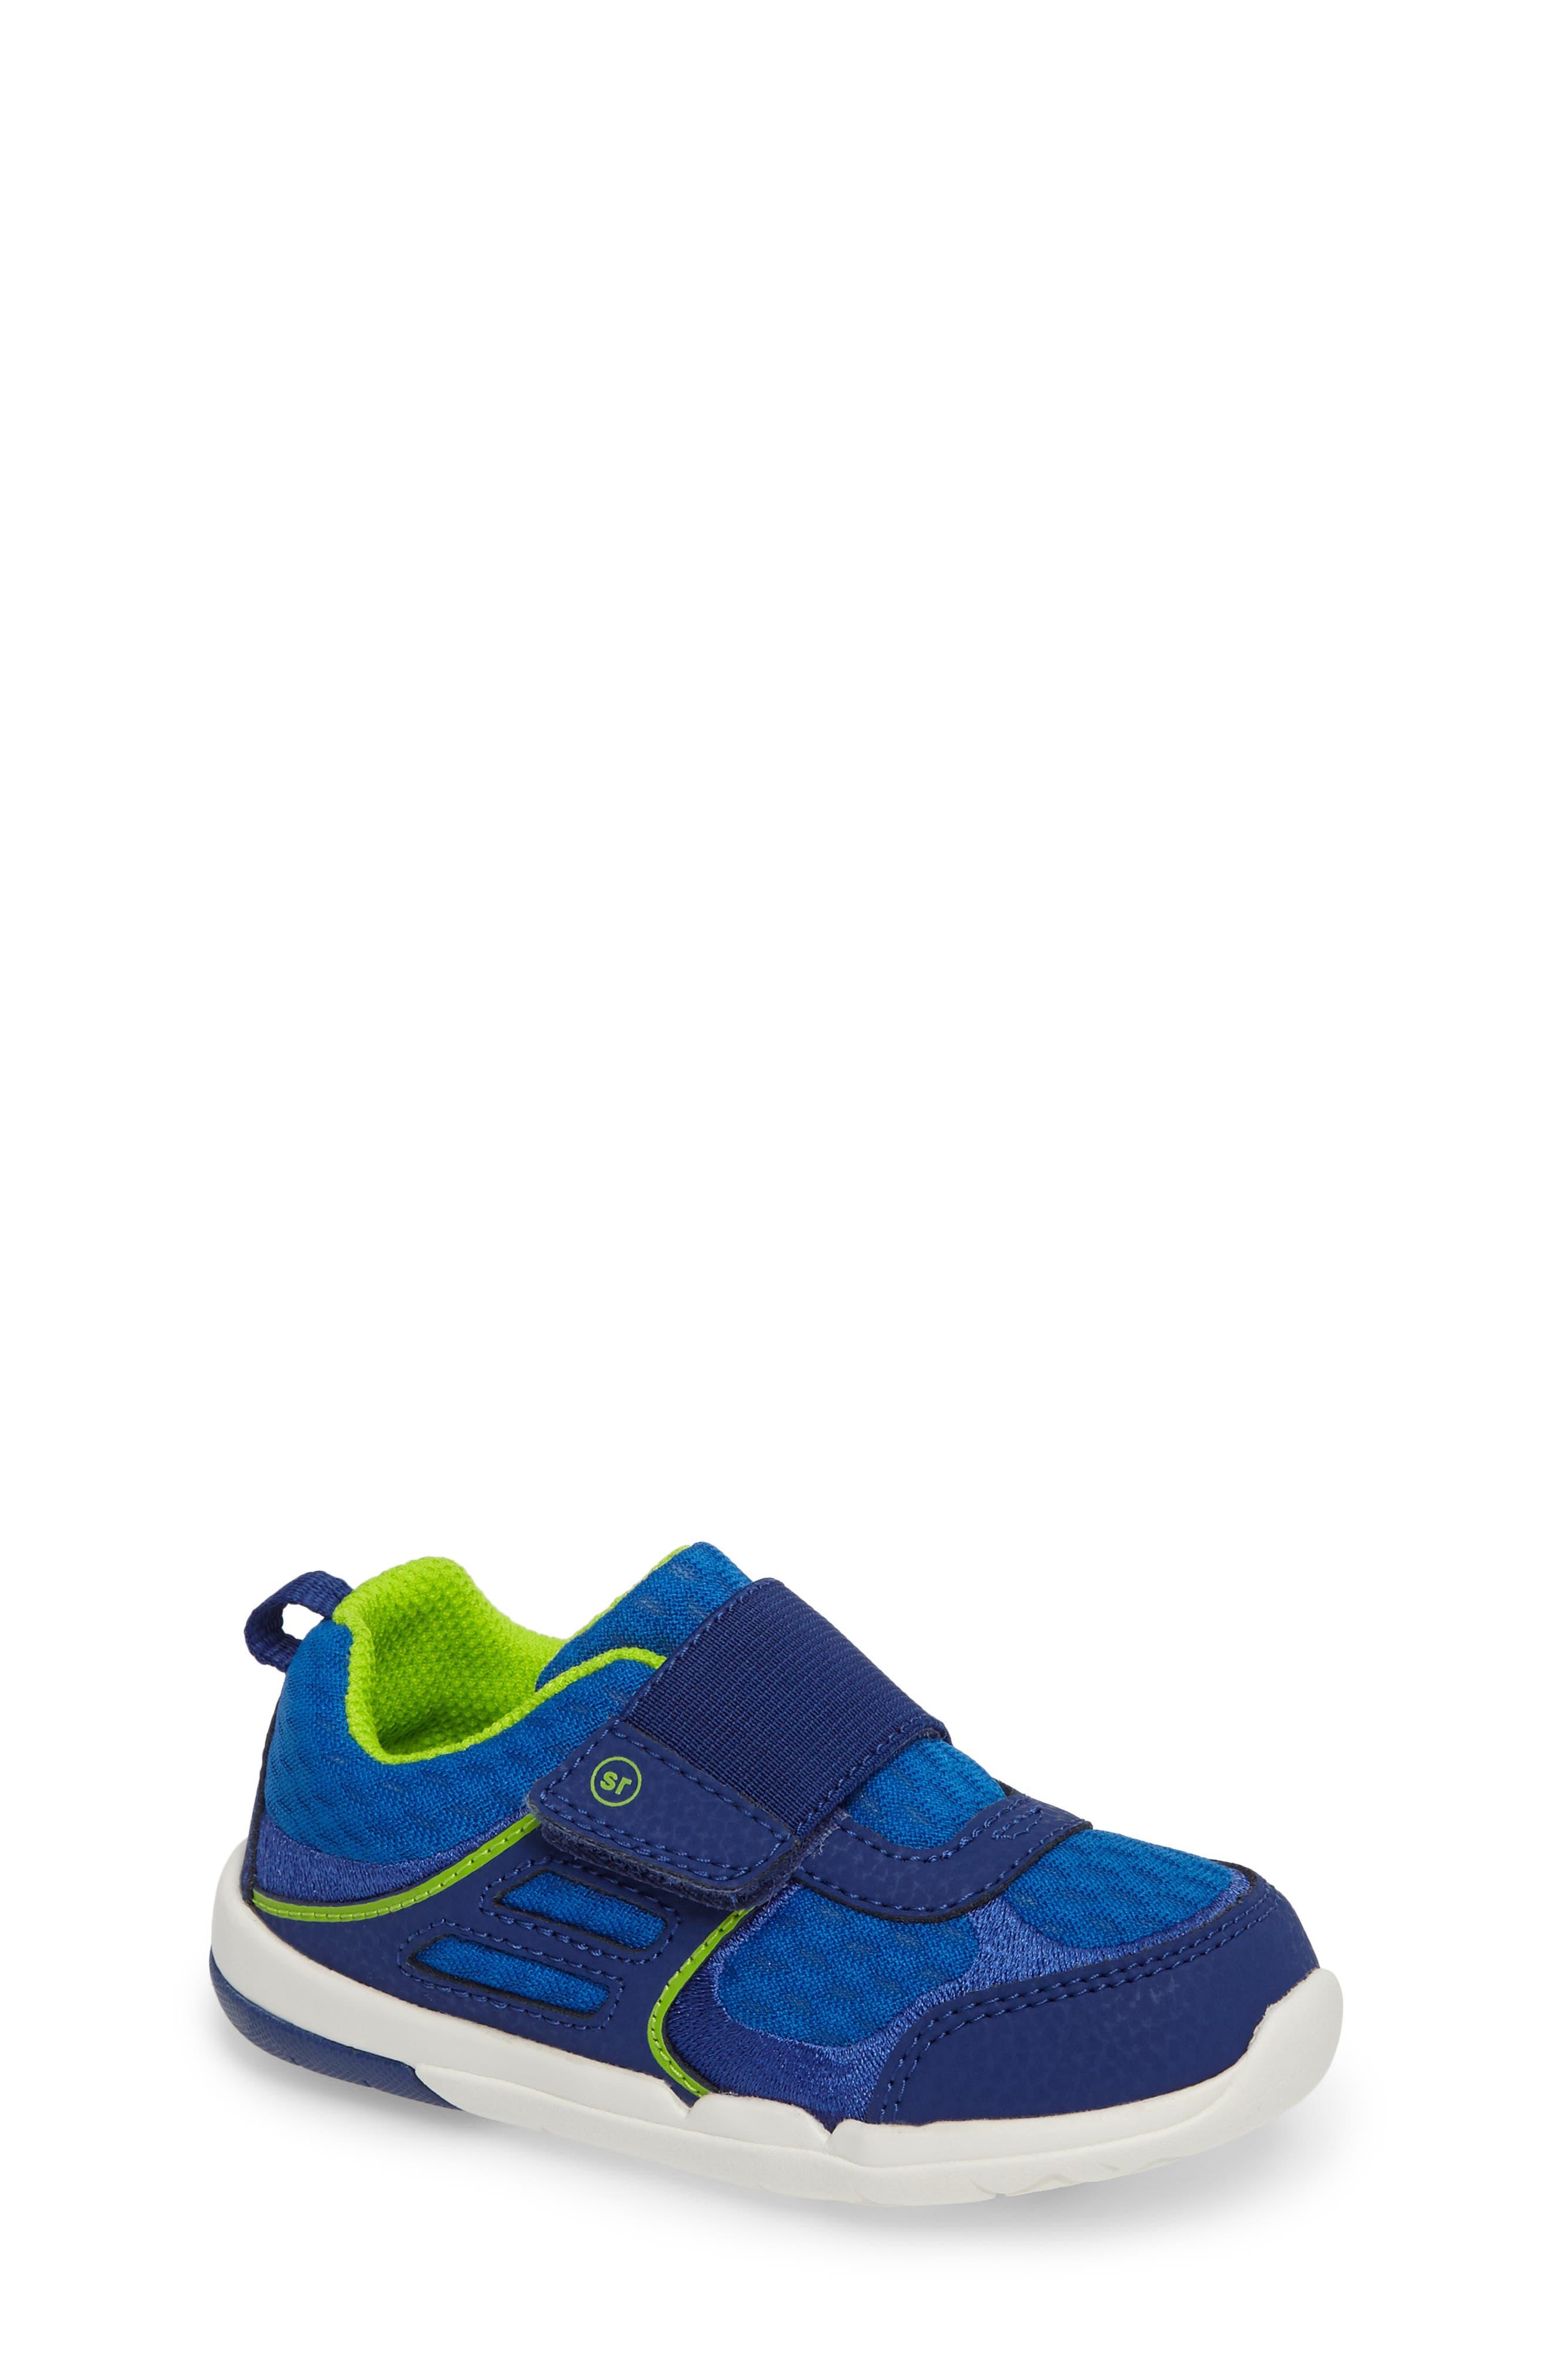 Casey Sneaker,                             Main thumbnail 1, color,                             420